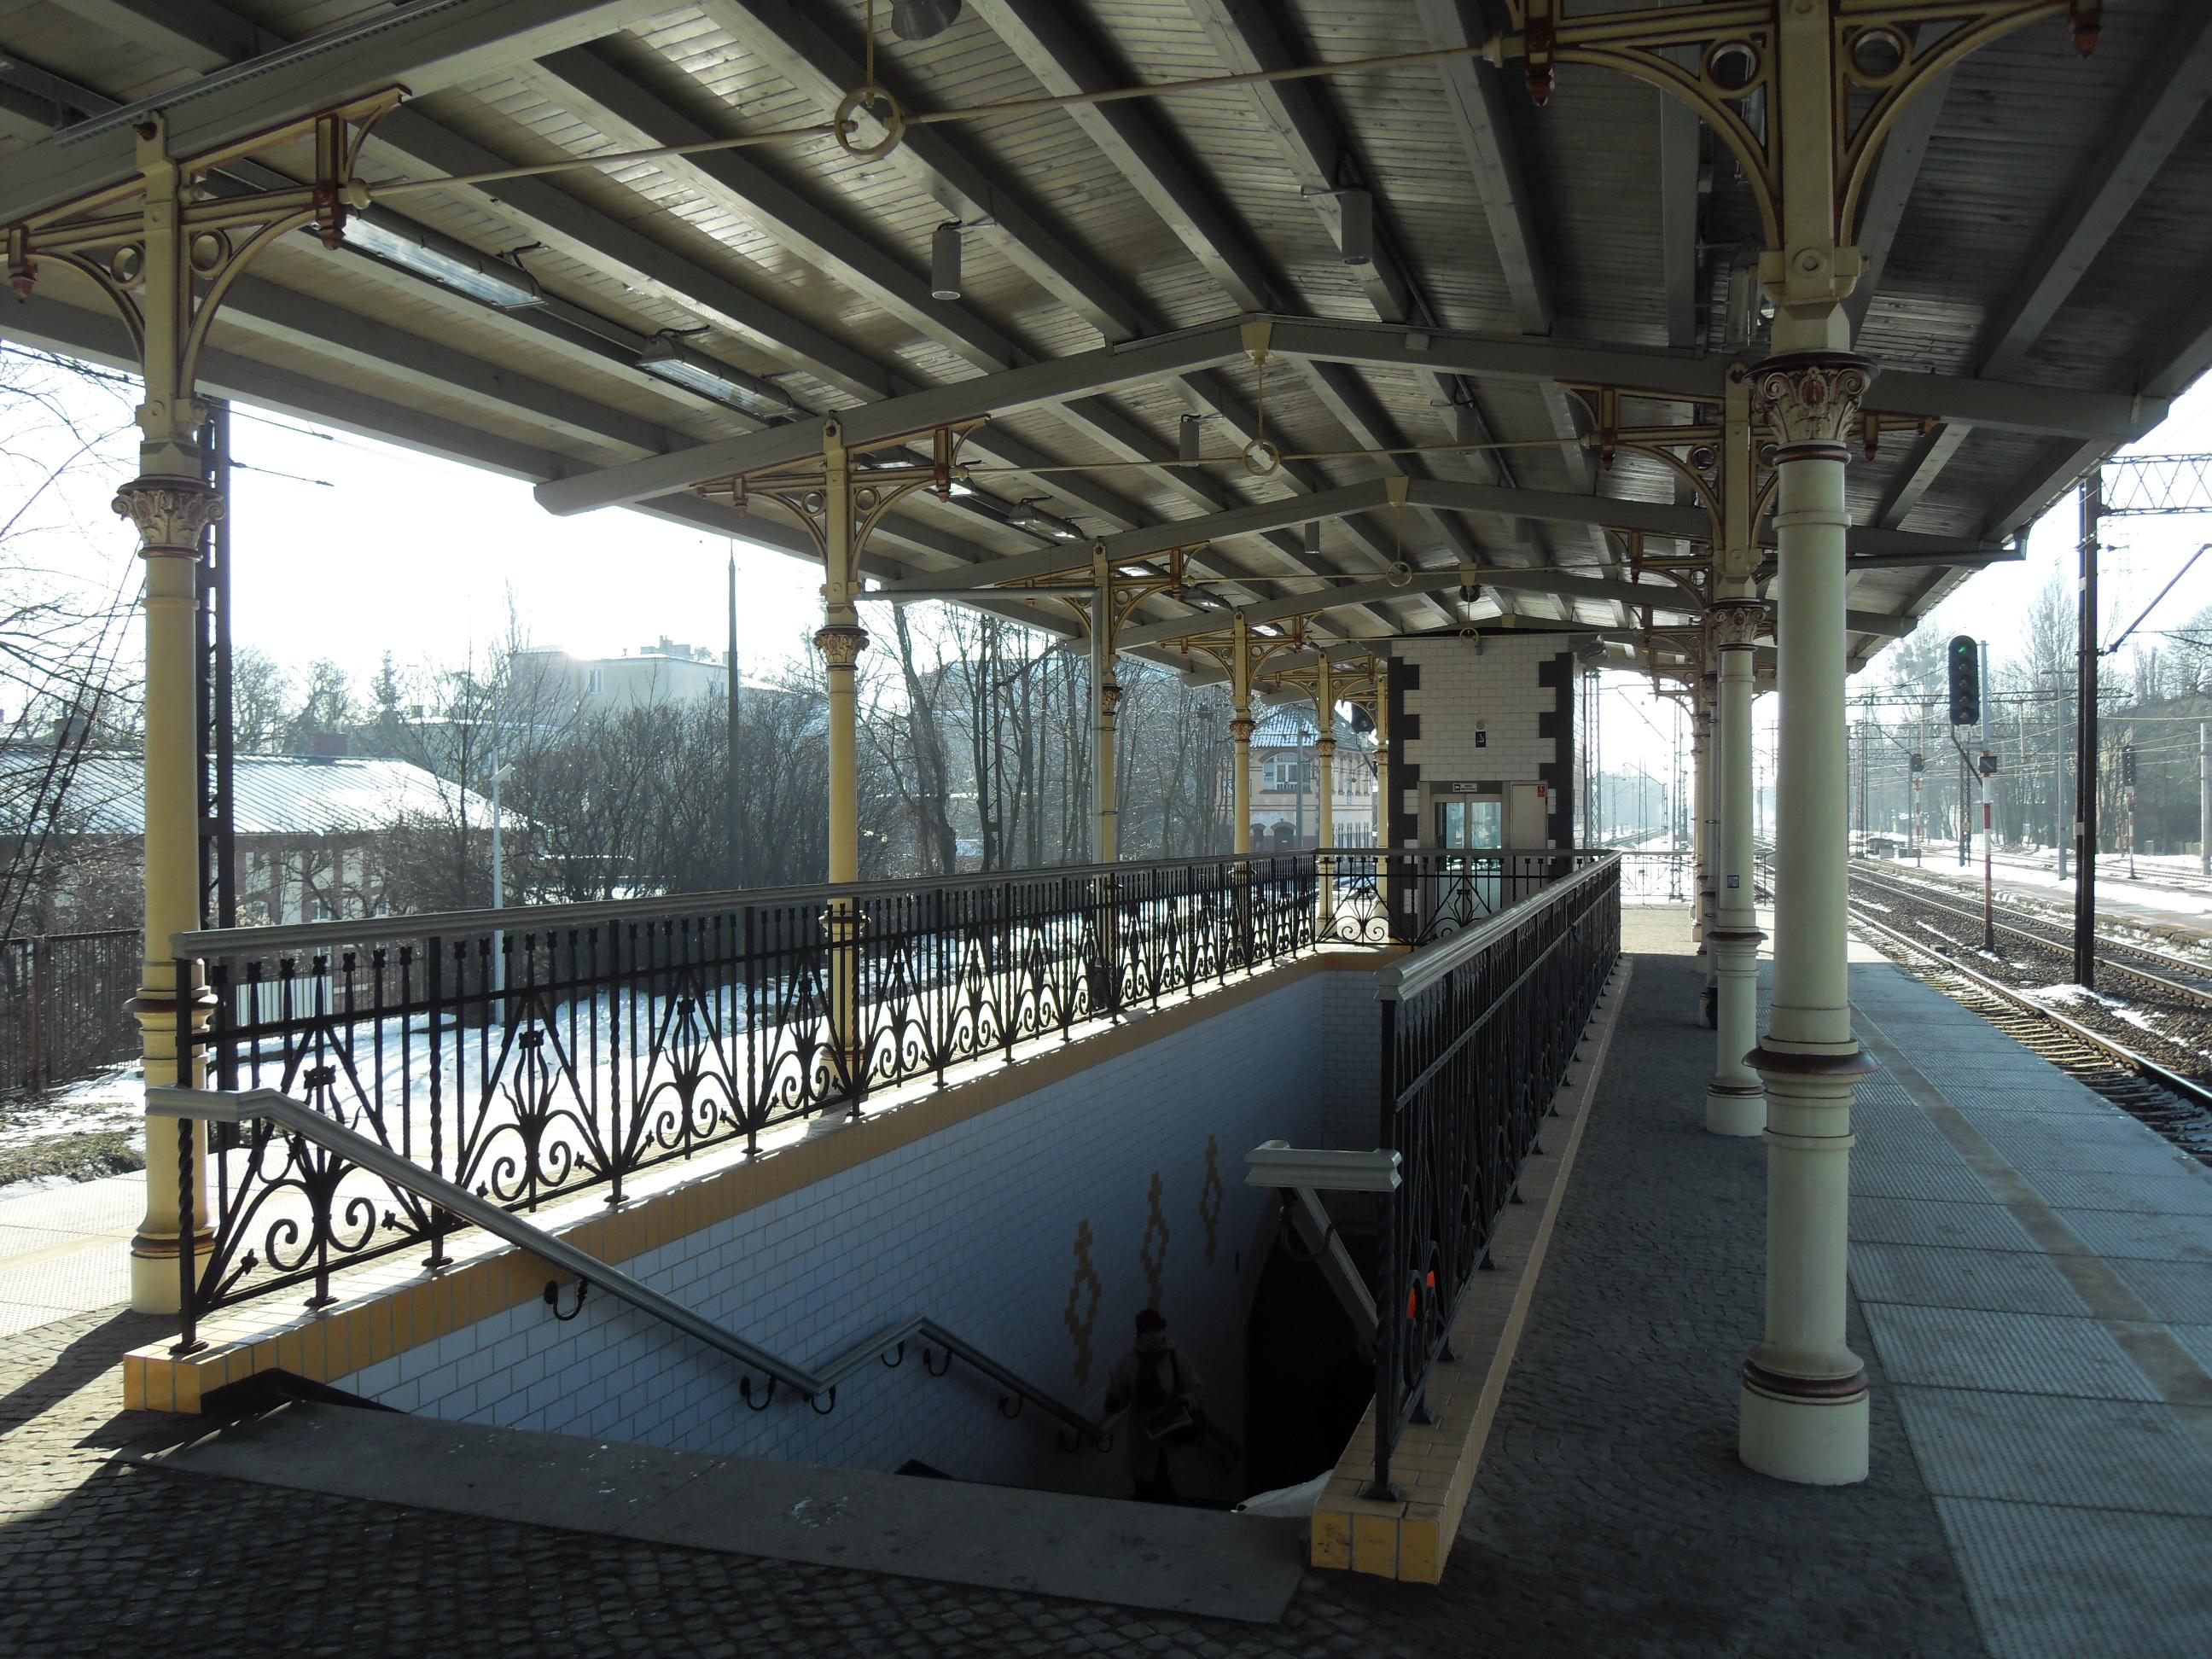 Bahnhof Sopot, Foto: Wikimedia Commons, Artur Andrzej